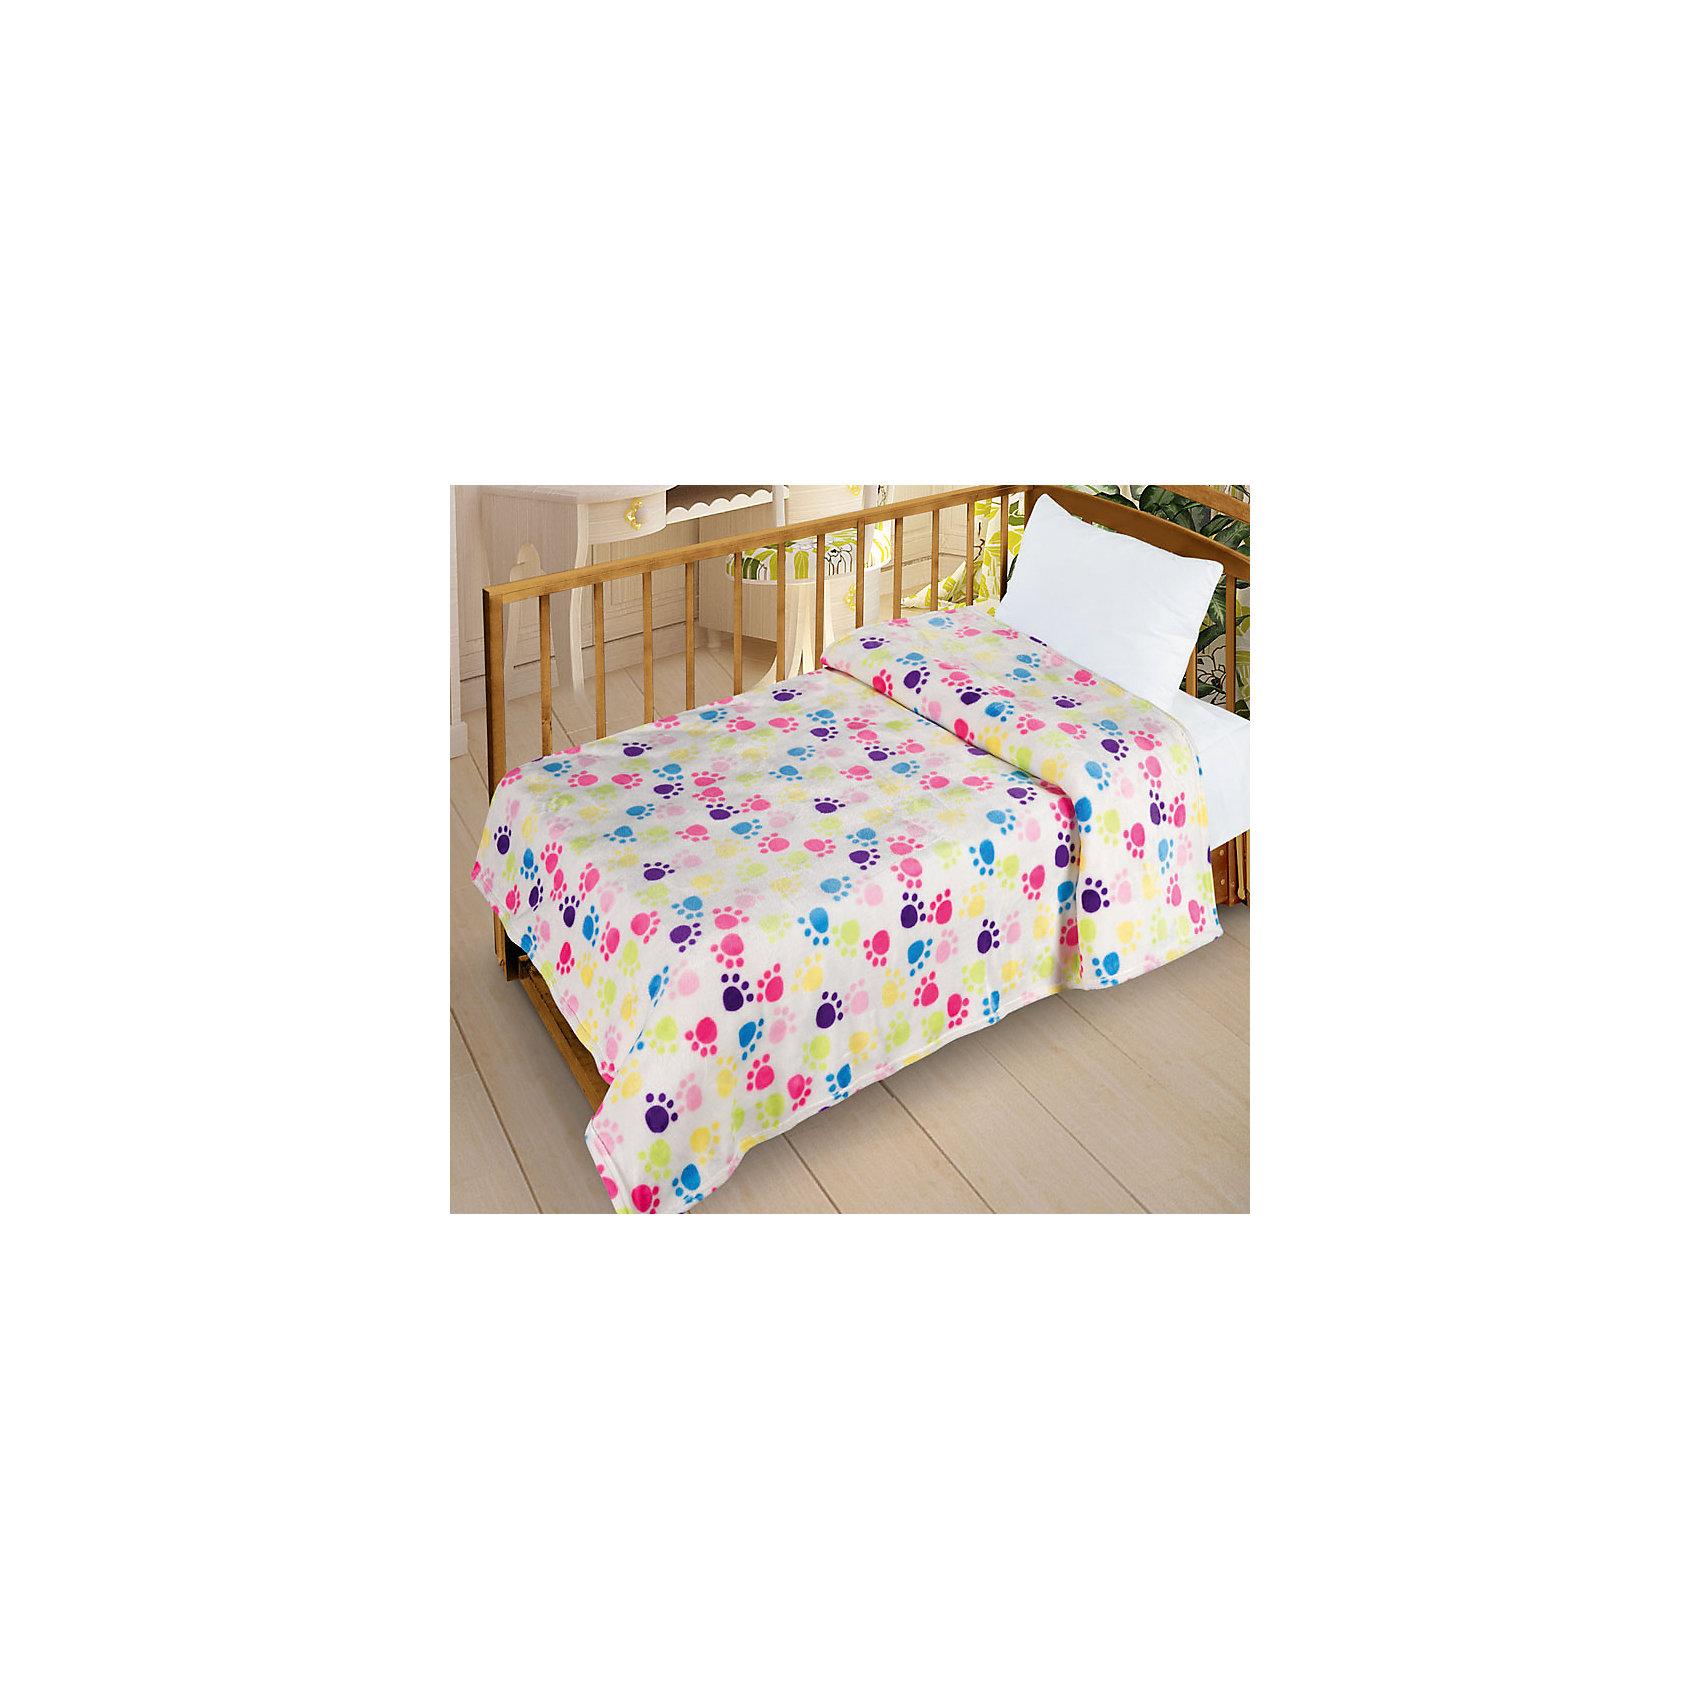 Letto Плед  Велсофт-беби в кроватку VB07, 95х130 балдахин на детскую кроватку купить в пензе